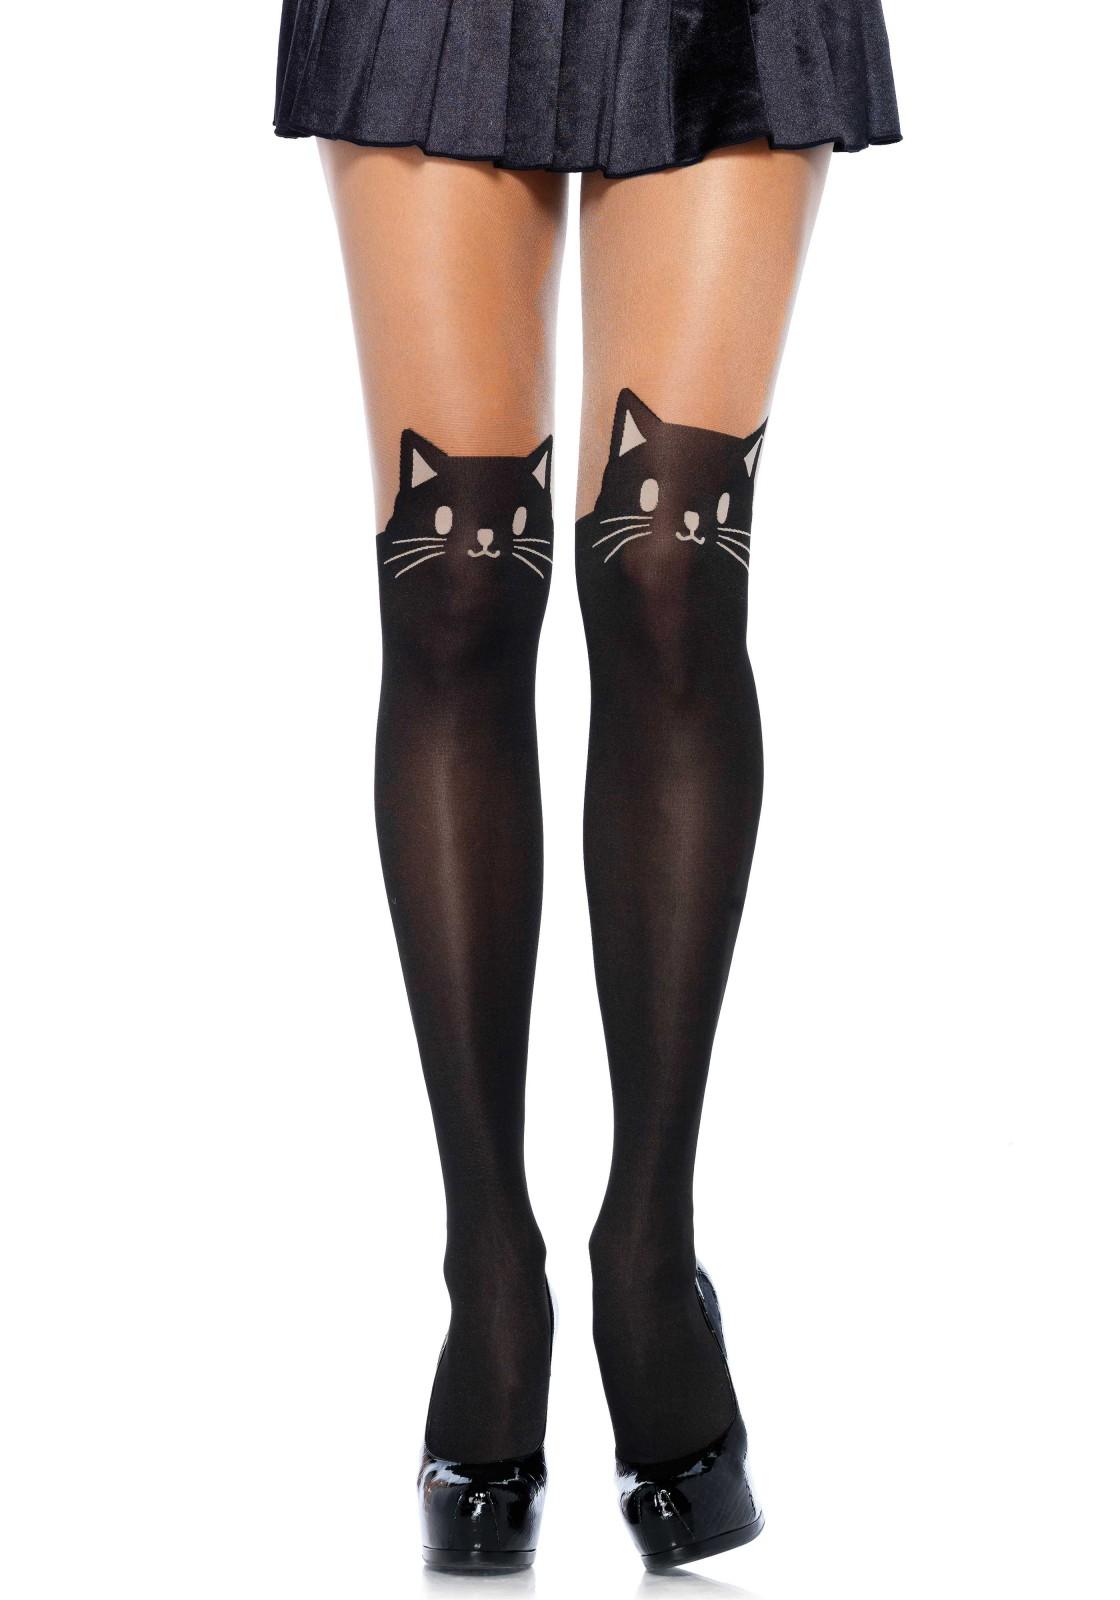 Black Cat Opaque Pantyhose